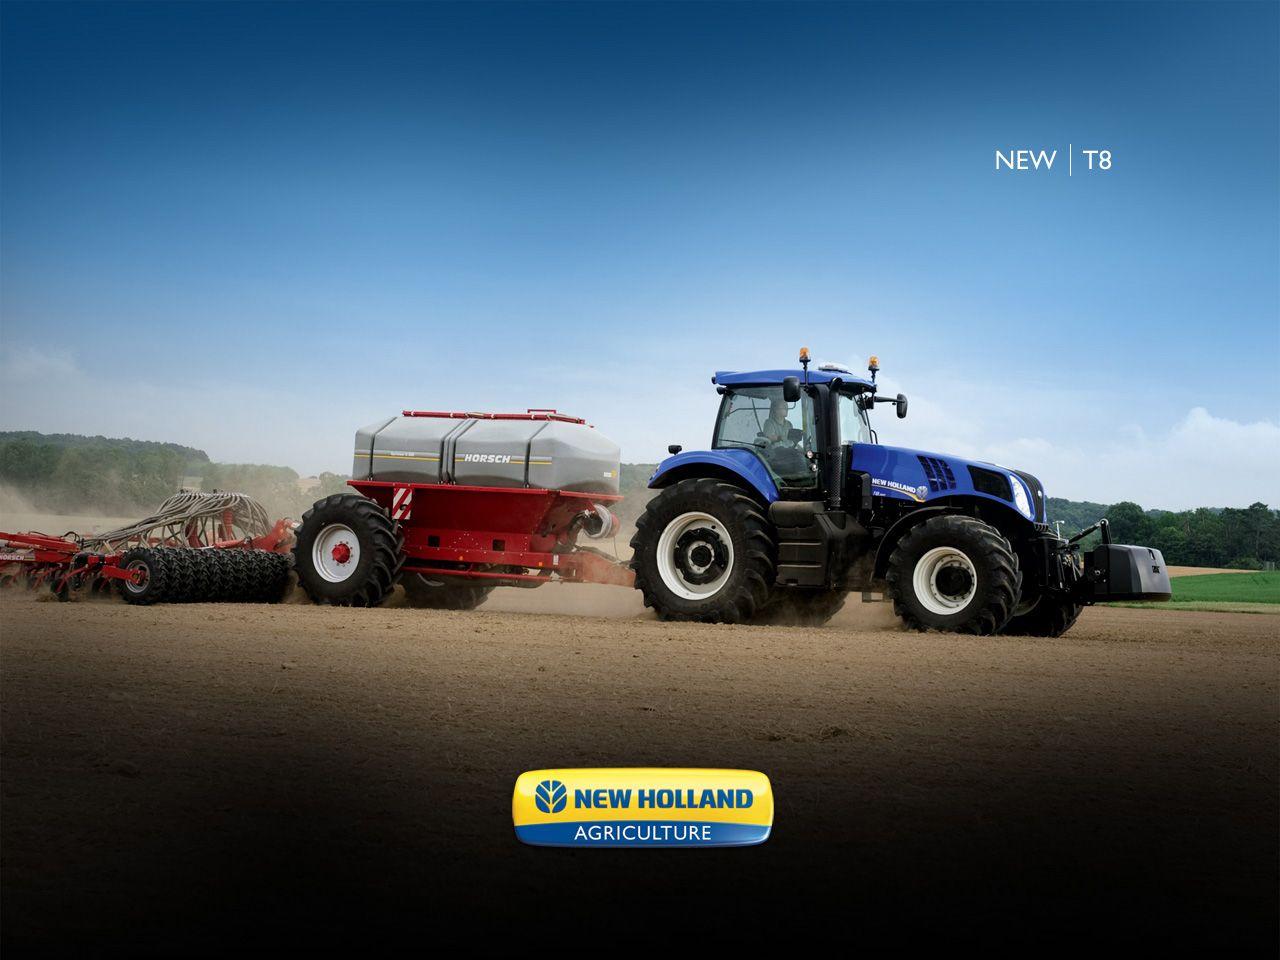 Download Wallpaper 1280x960 Tractor, Field, Arable land .